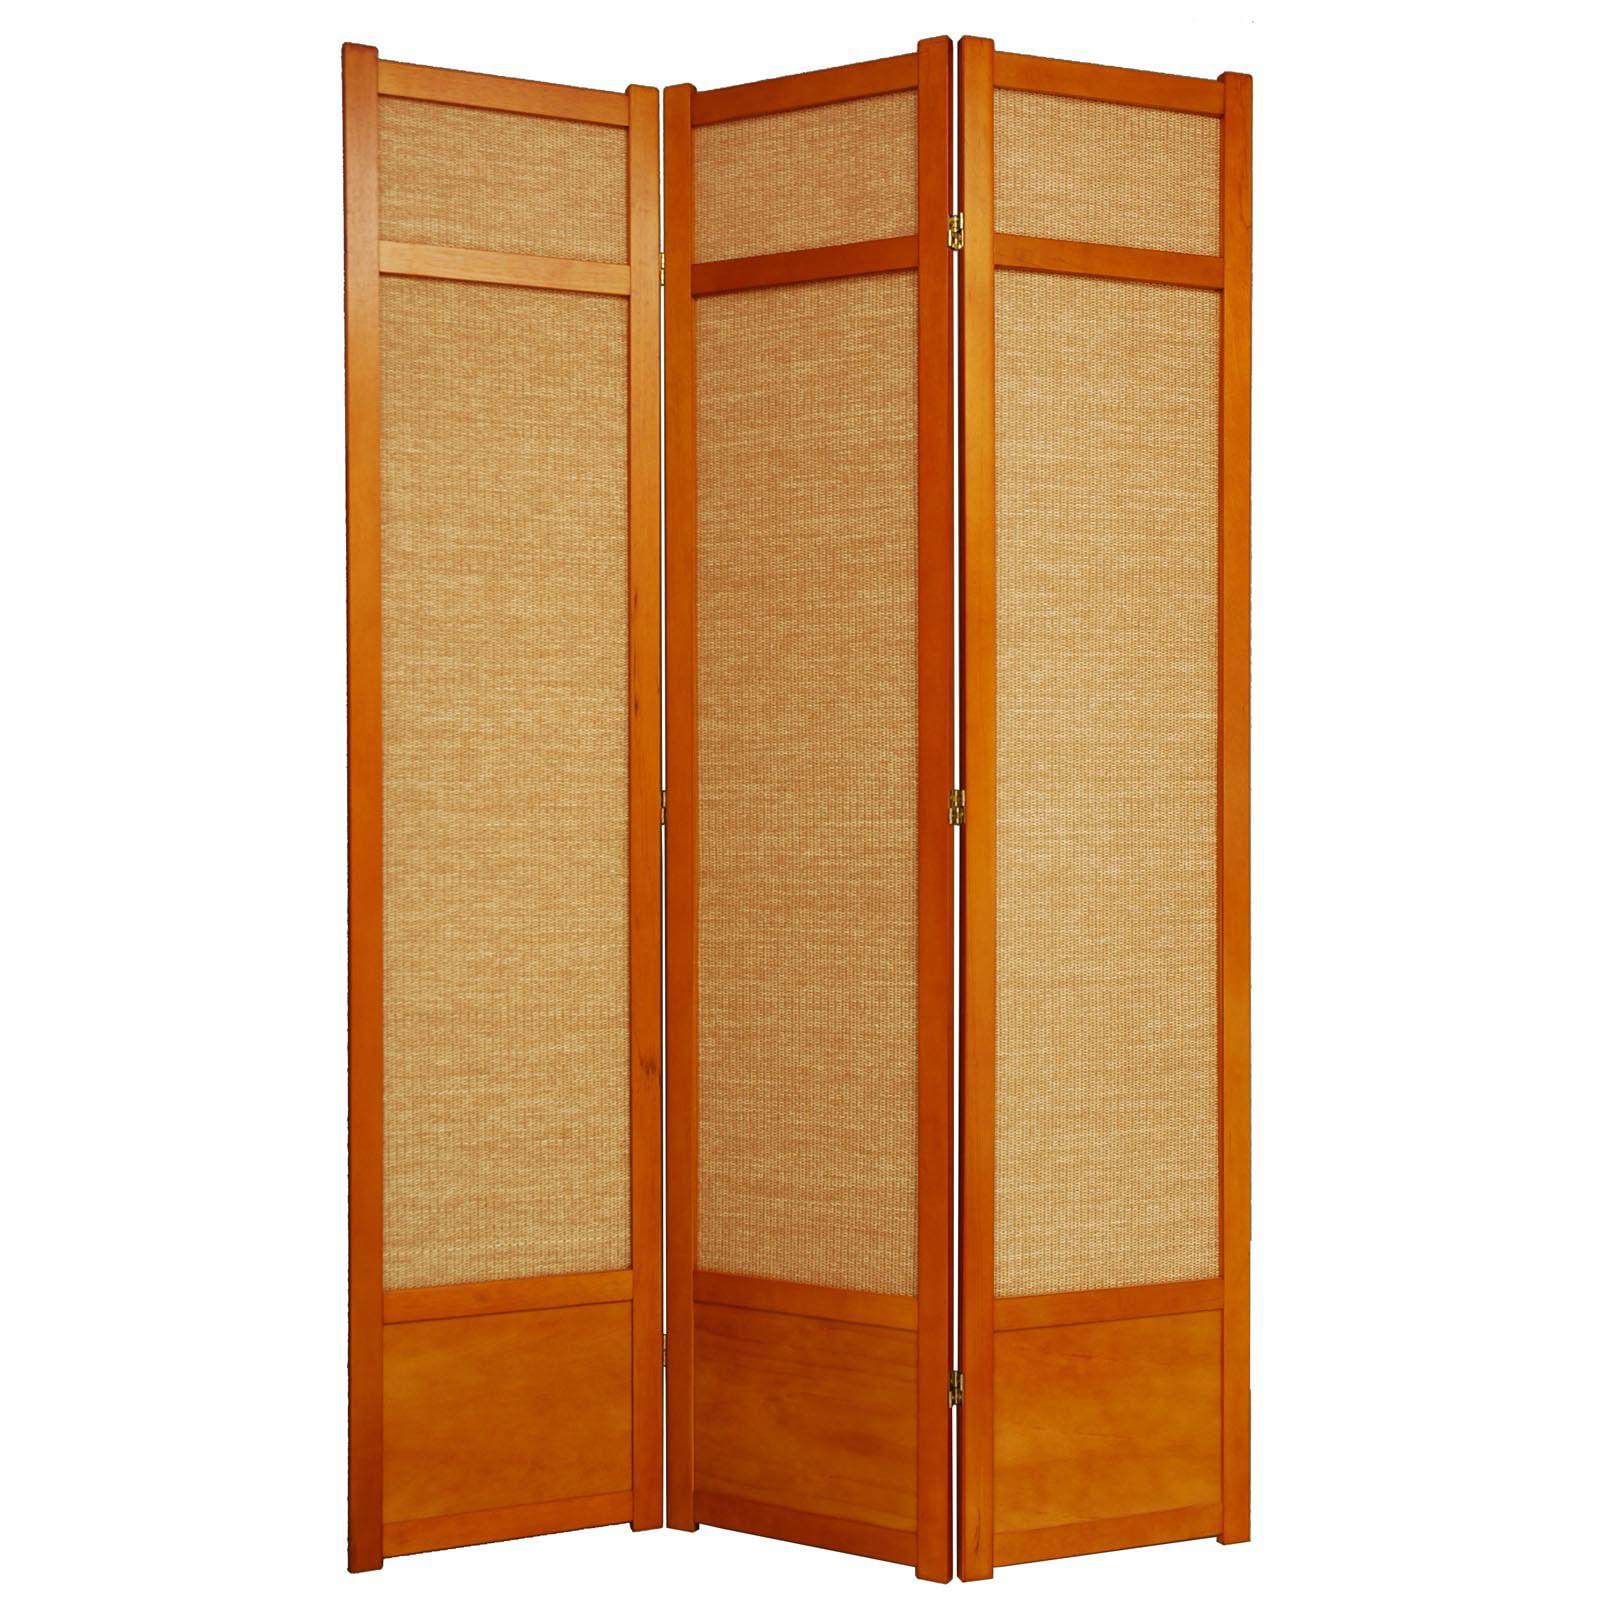 Oriental Furniture Jute Fiber Shoji Screen Room Divider-8...